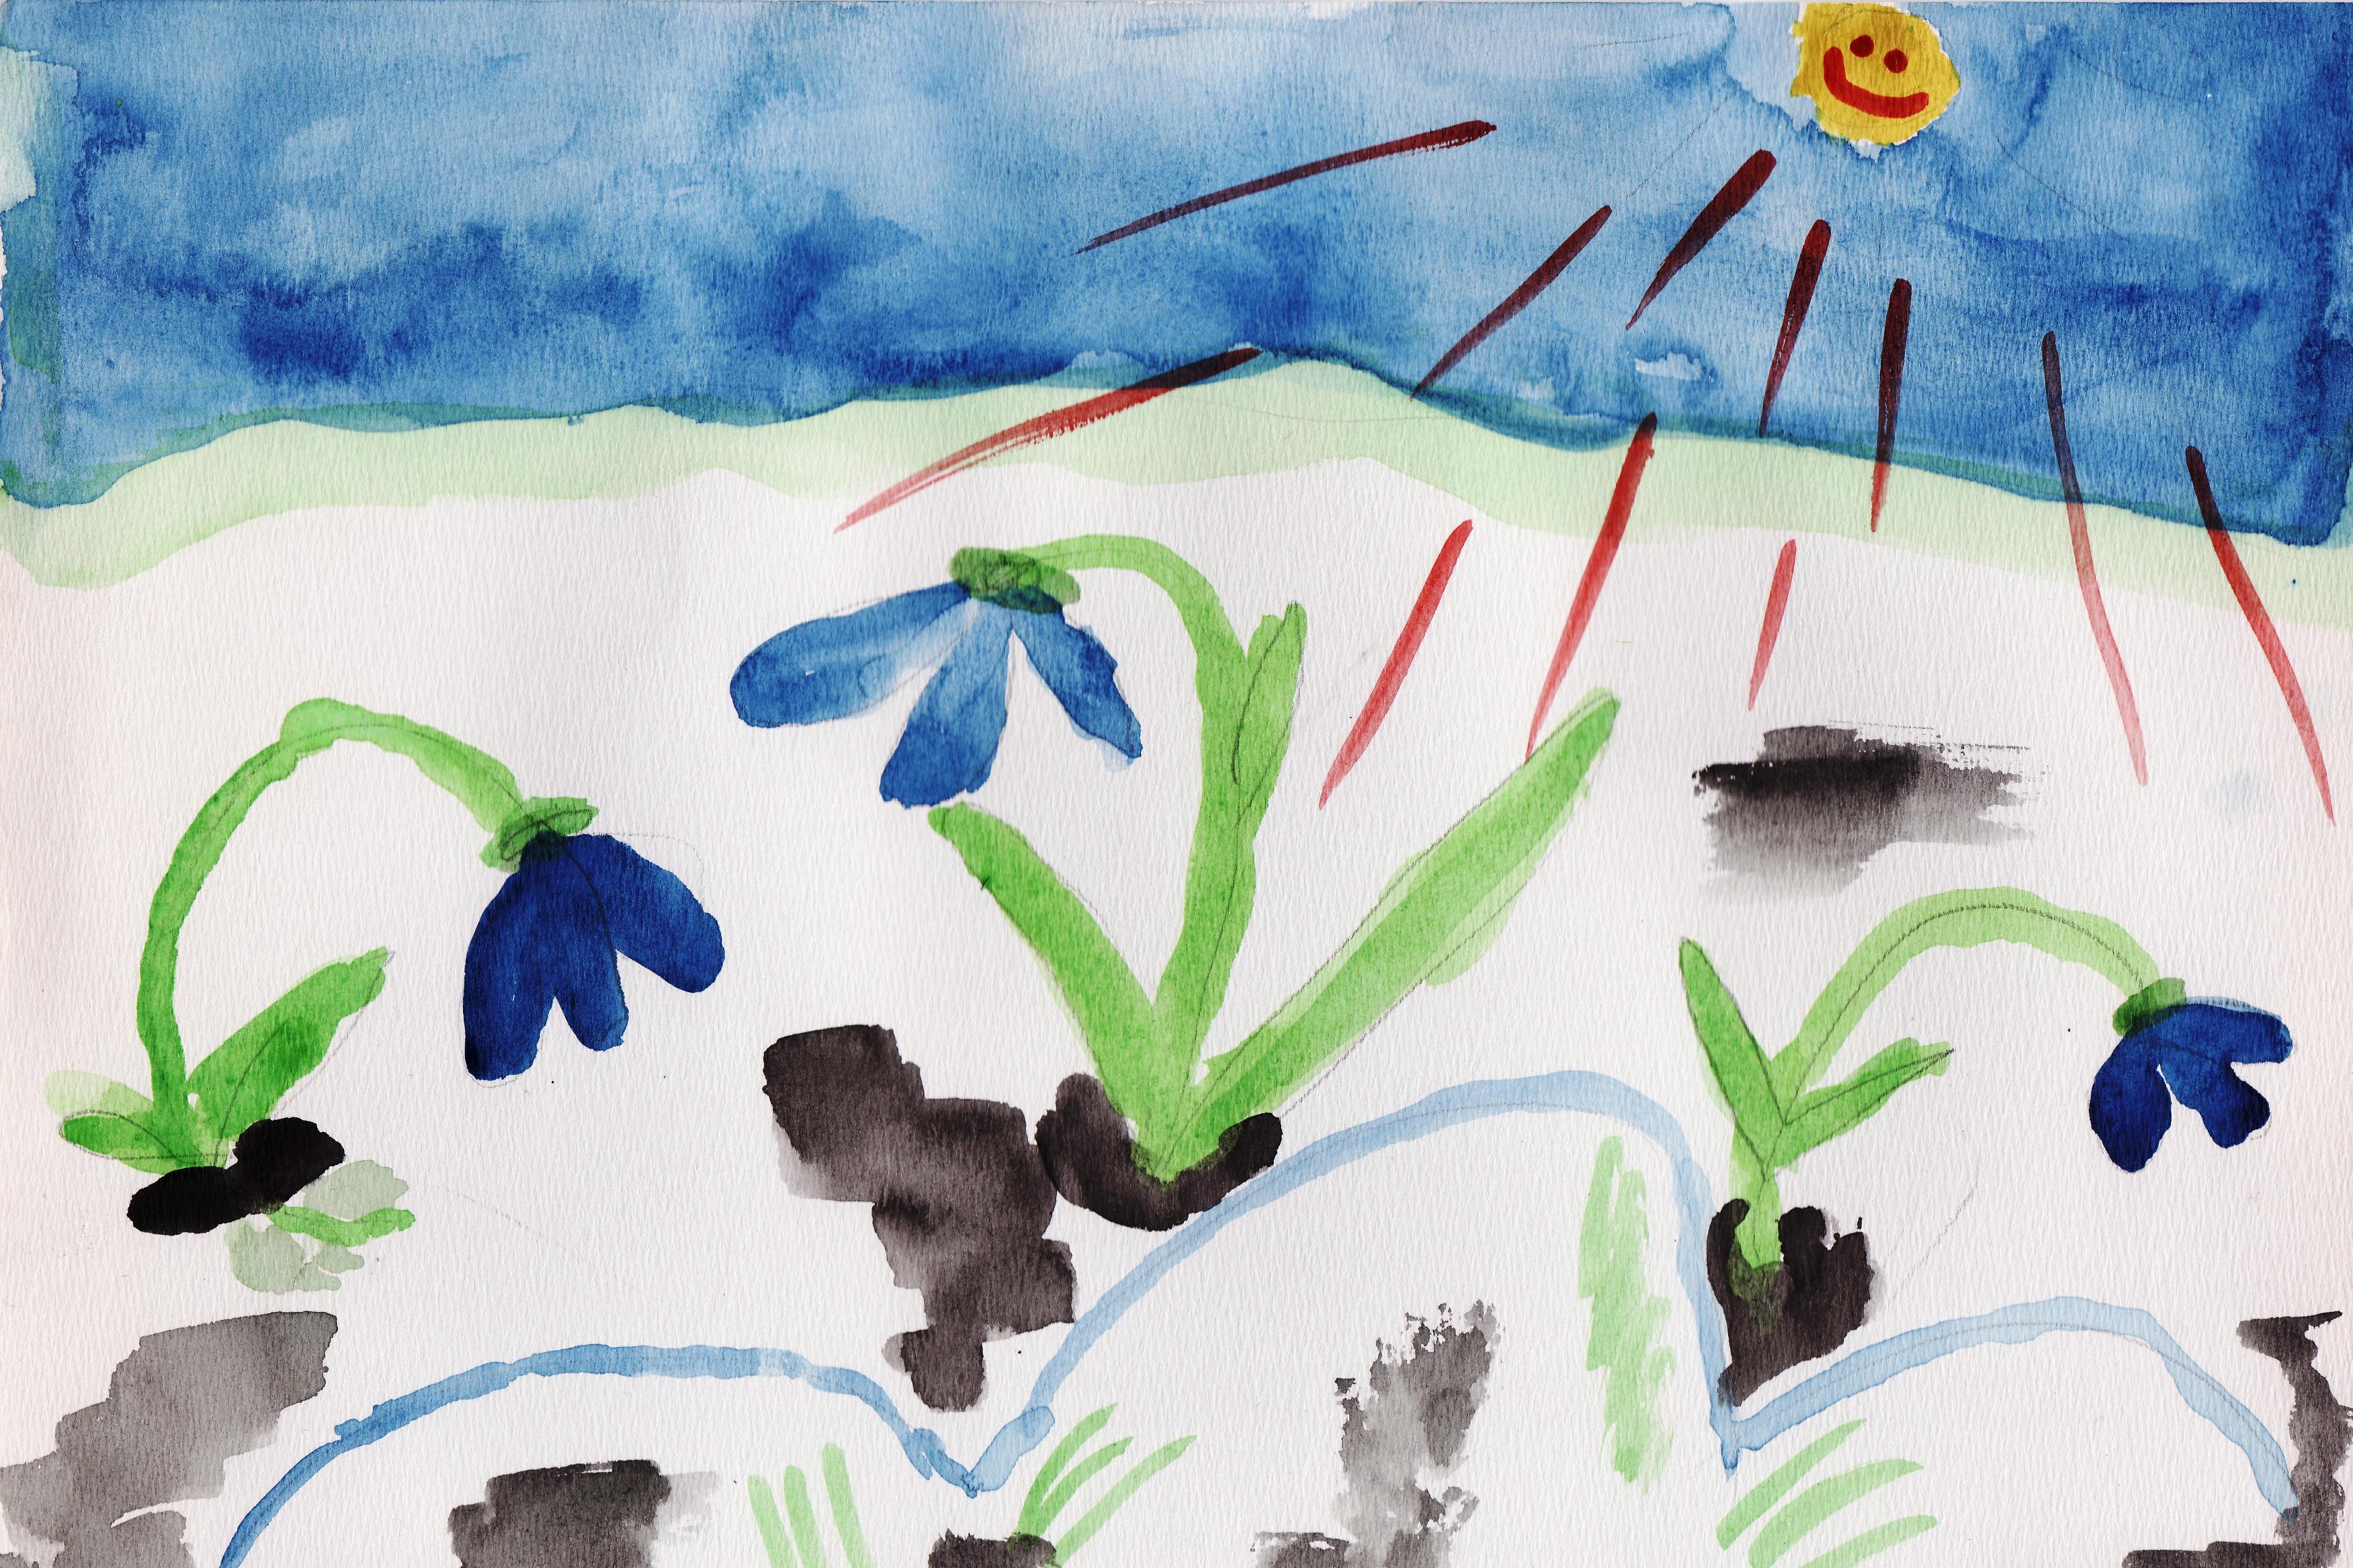 весна на конкурс тему рисунки детские